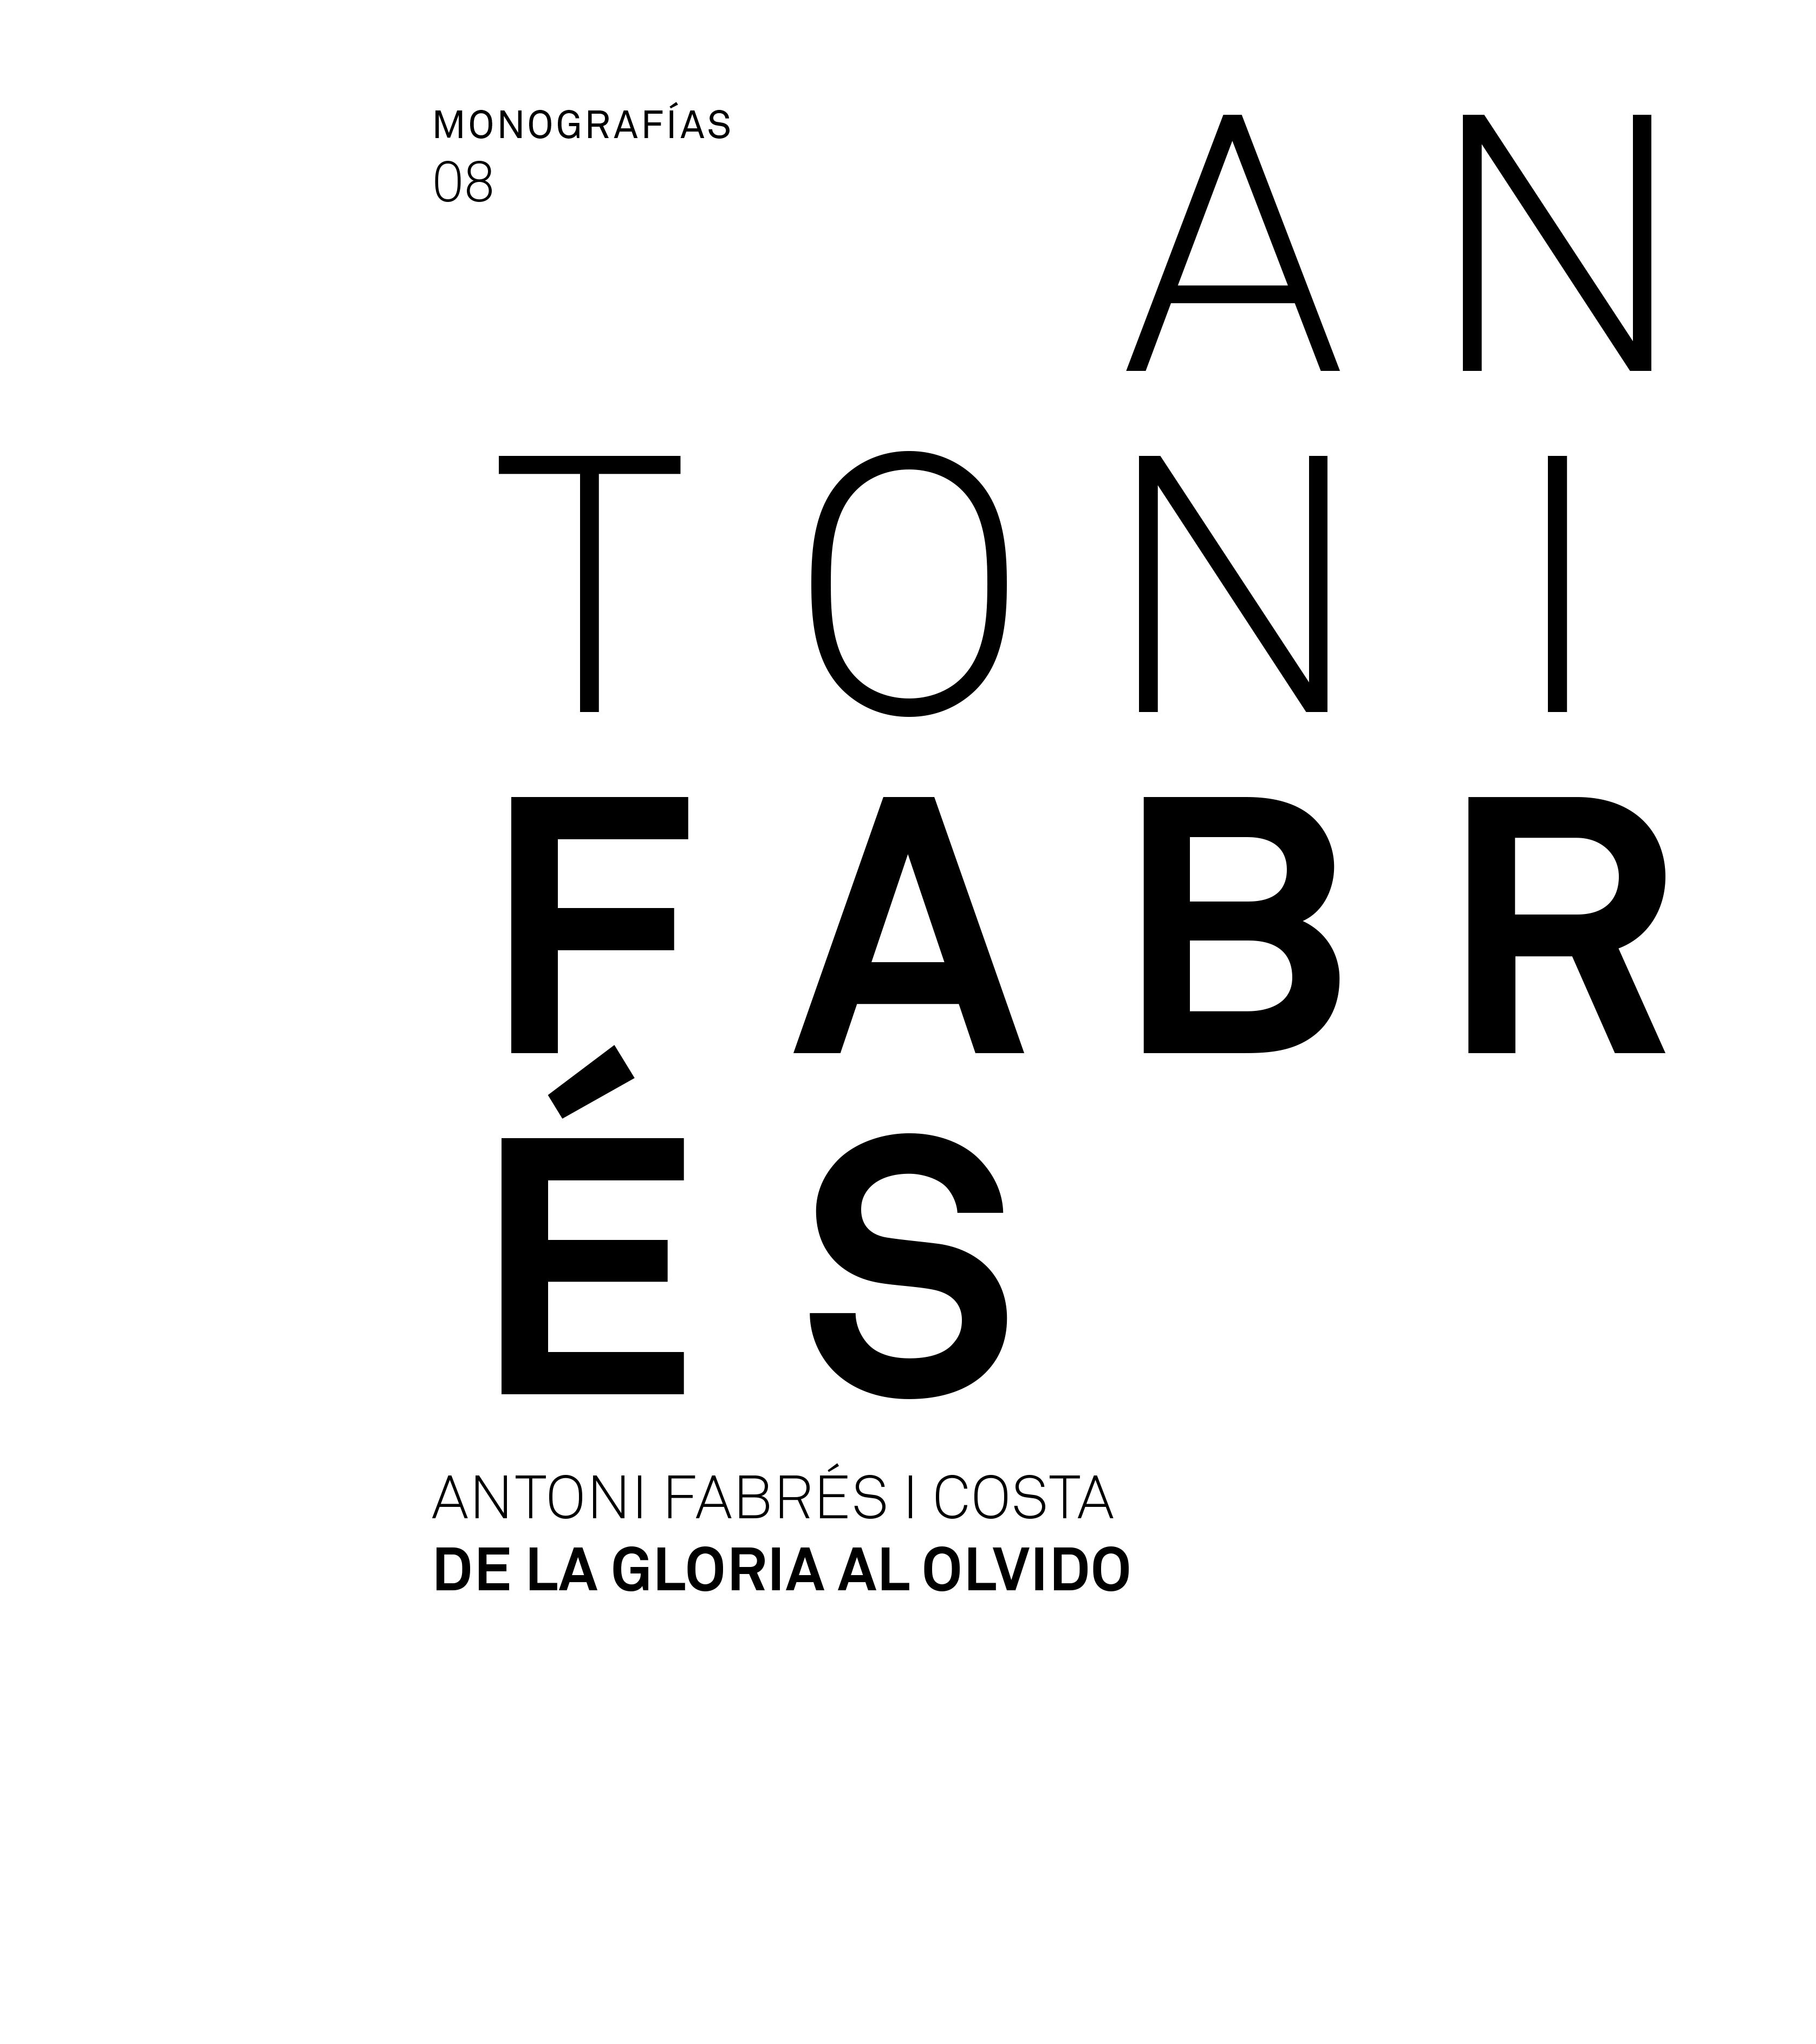 Antoni Fabrés. De la gloria al olvido - catálogo